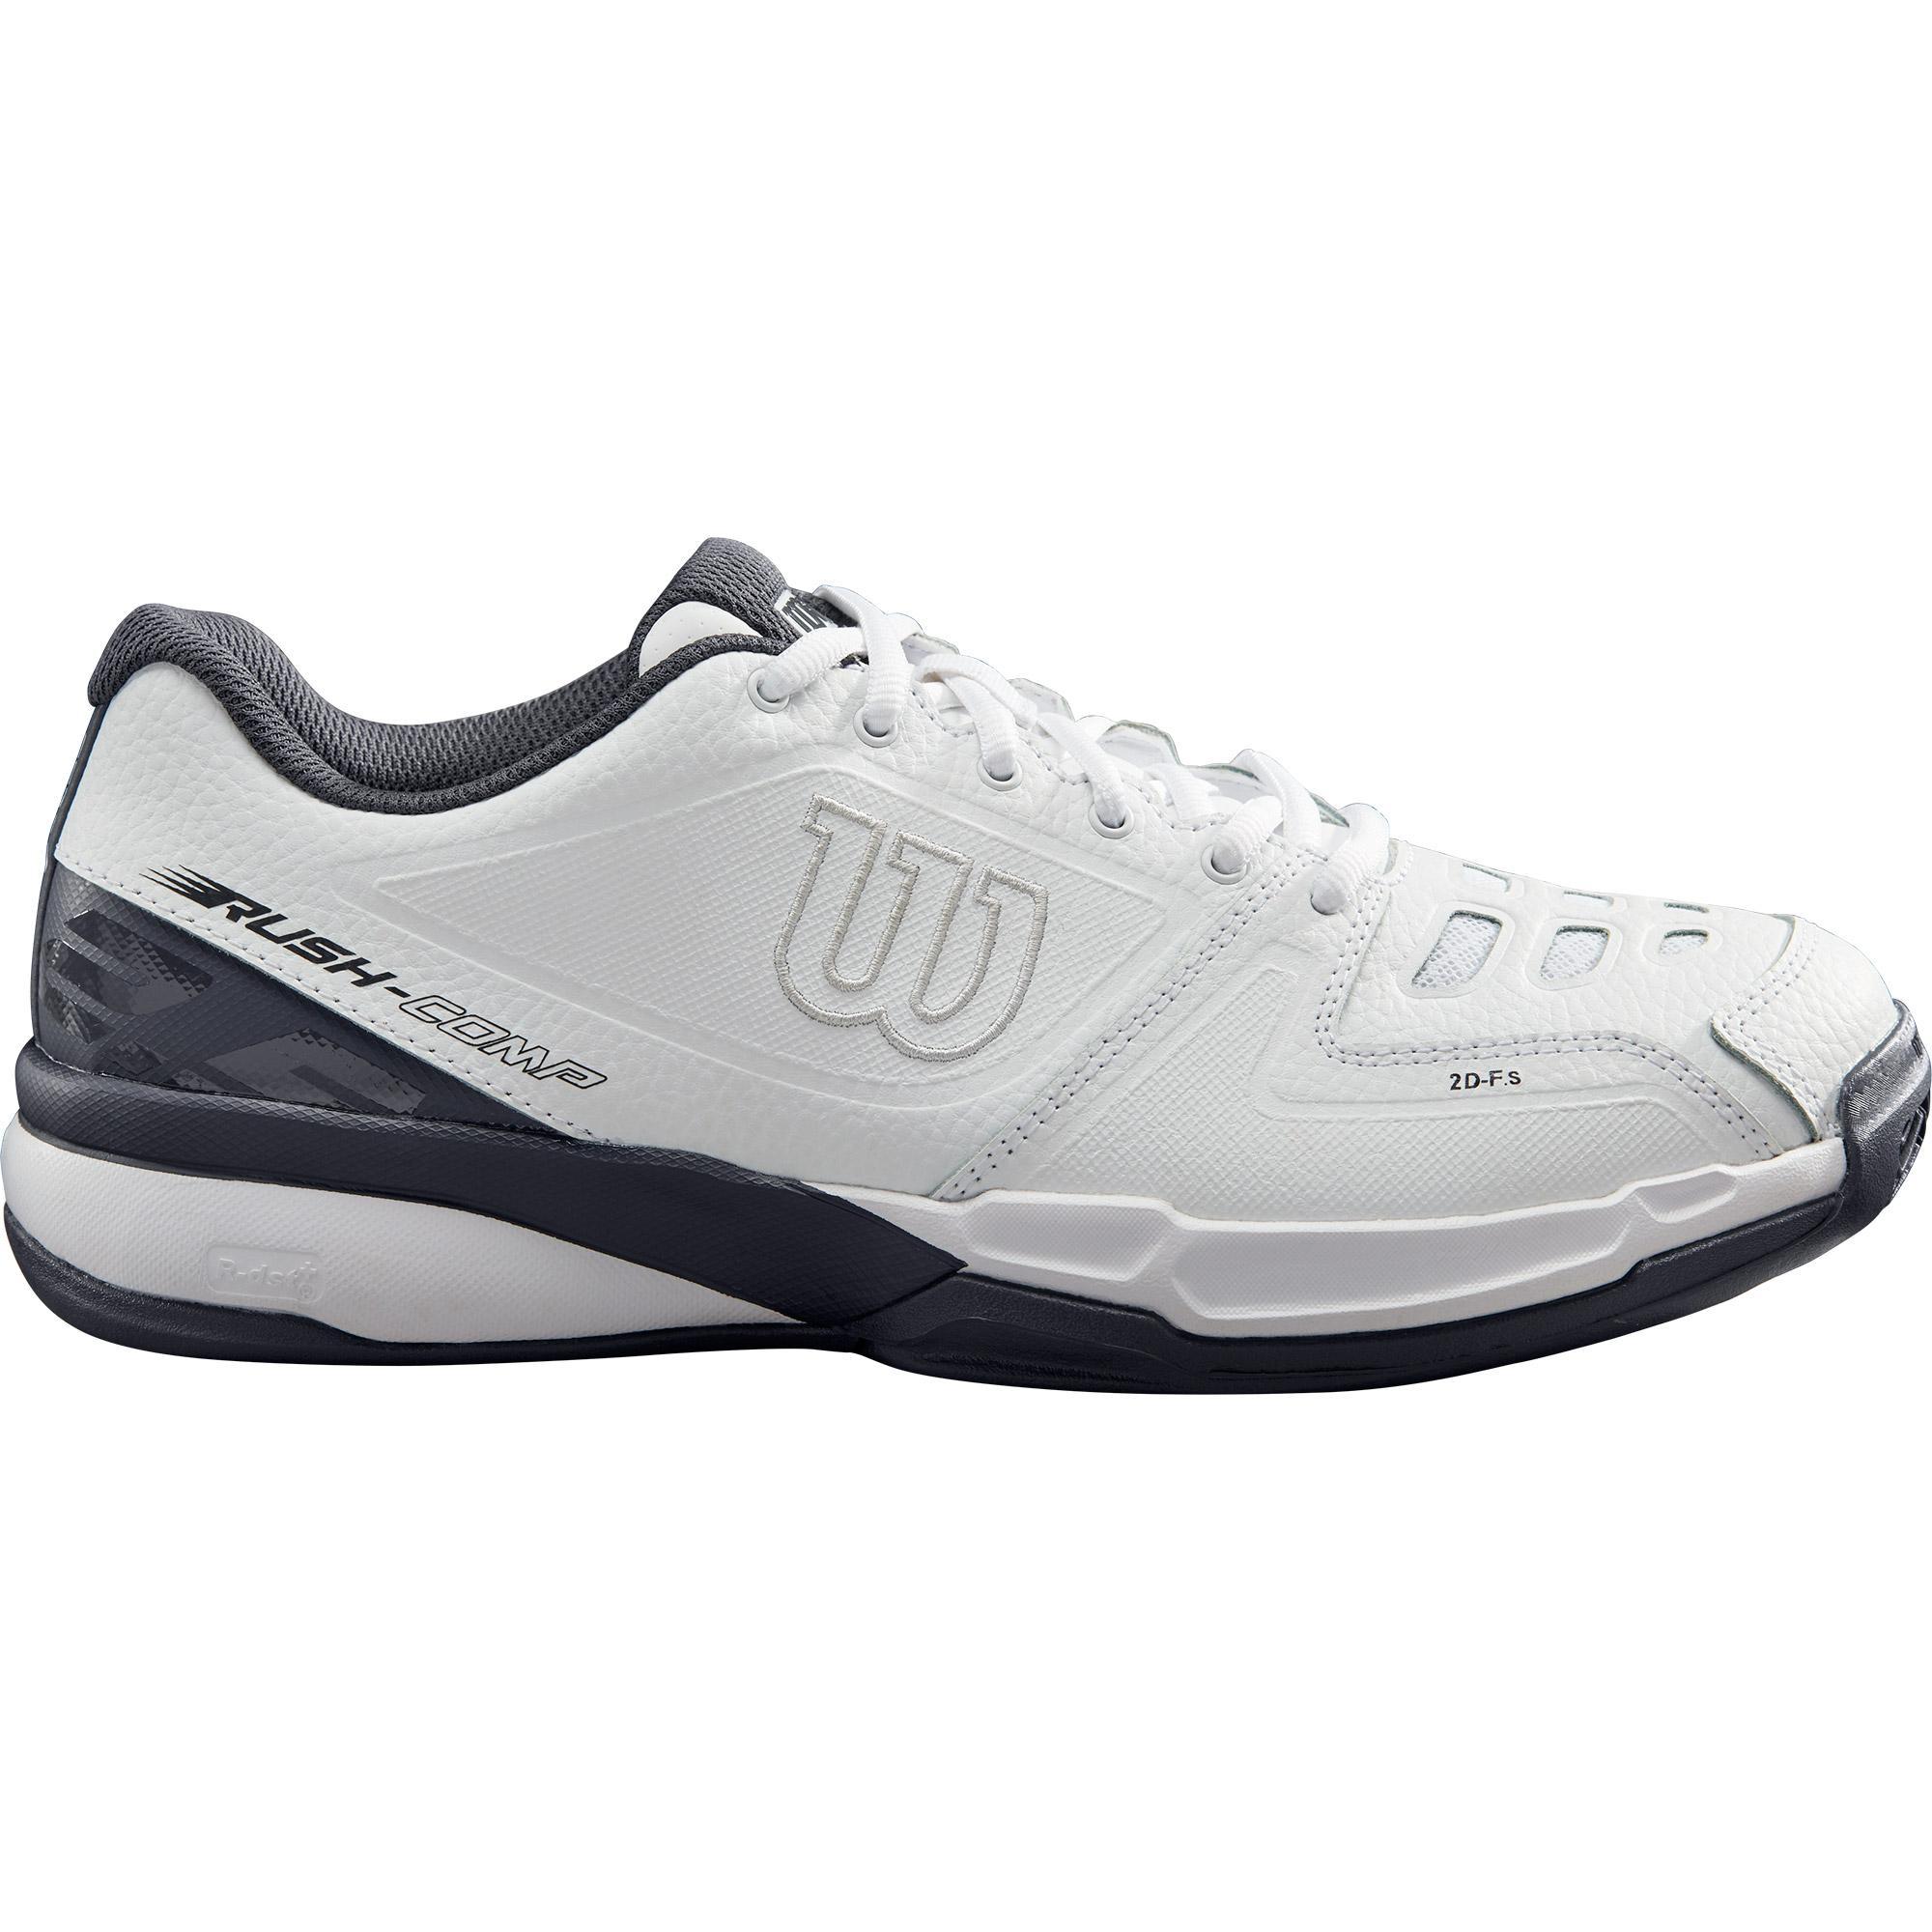 9a28e82158cf45 Wilson Mens Rush Competition Tennis Shoes - White/Ebony - Tennisnuts.com